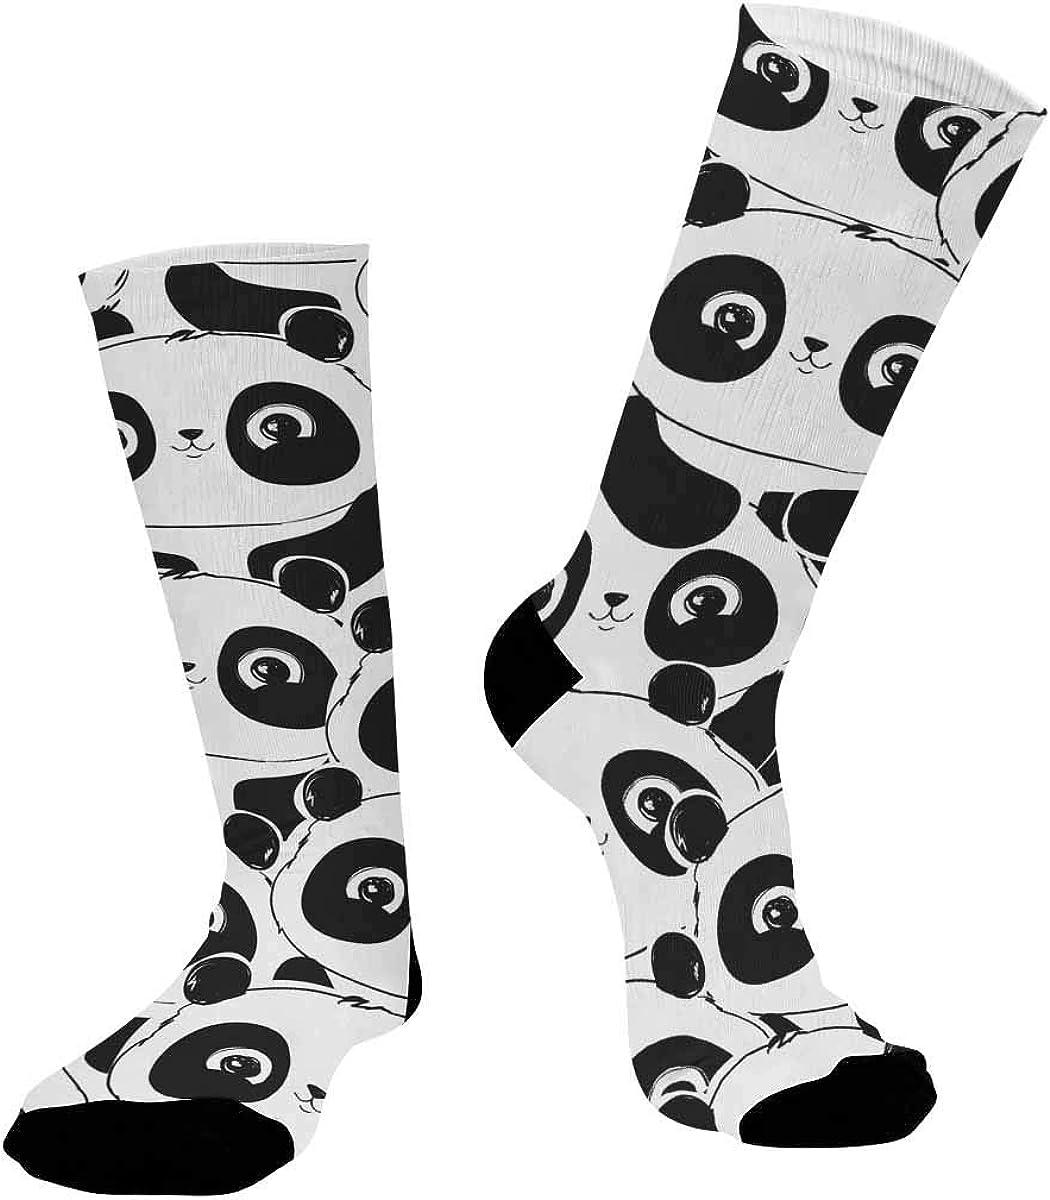 INTERESTPRINT Unisex Casual Sublimated Crew Running Socks Panda Pattern